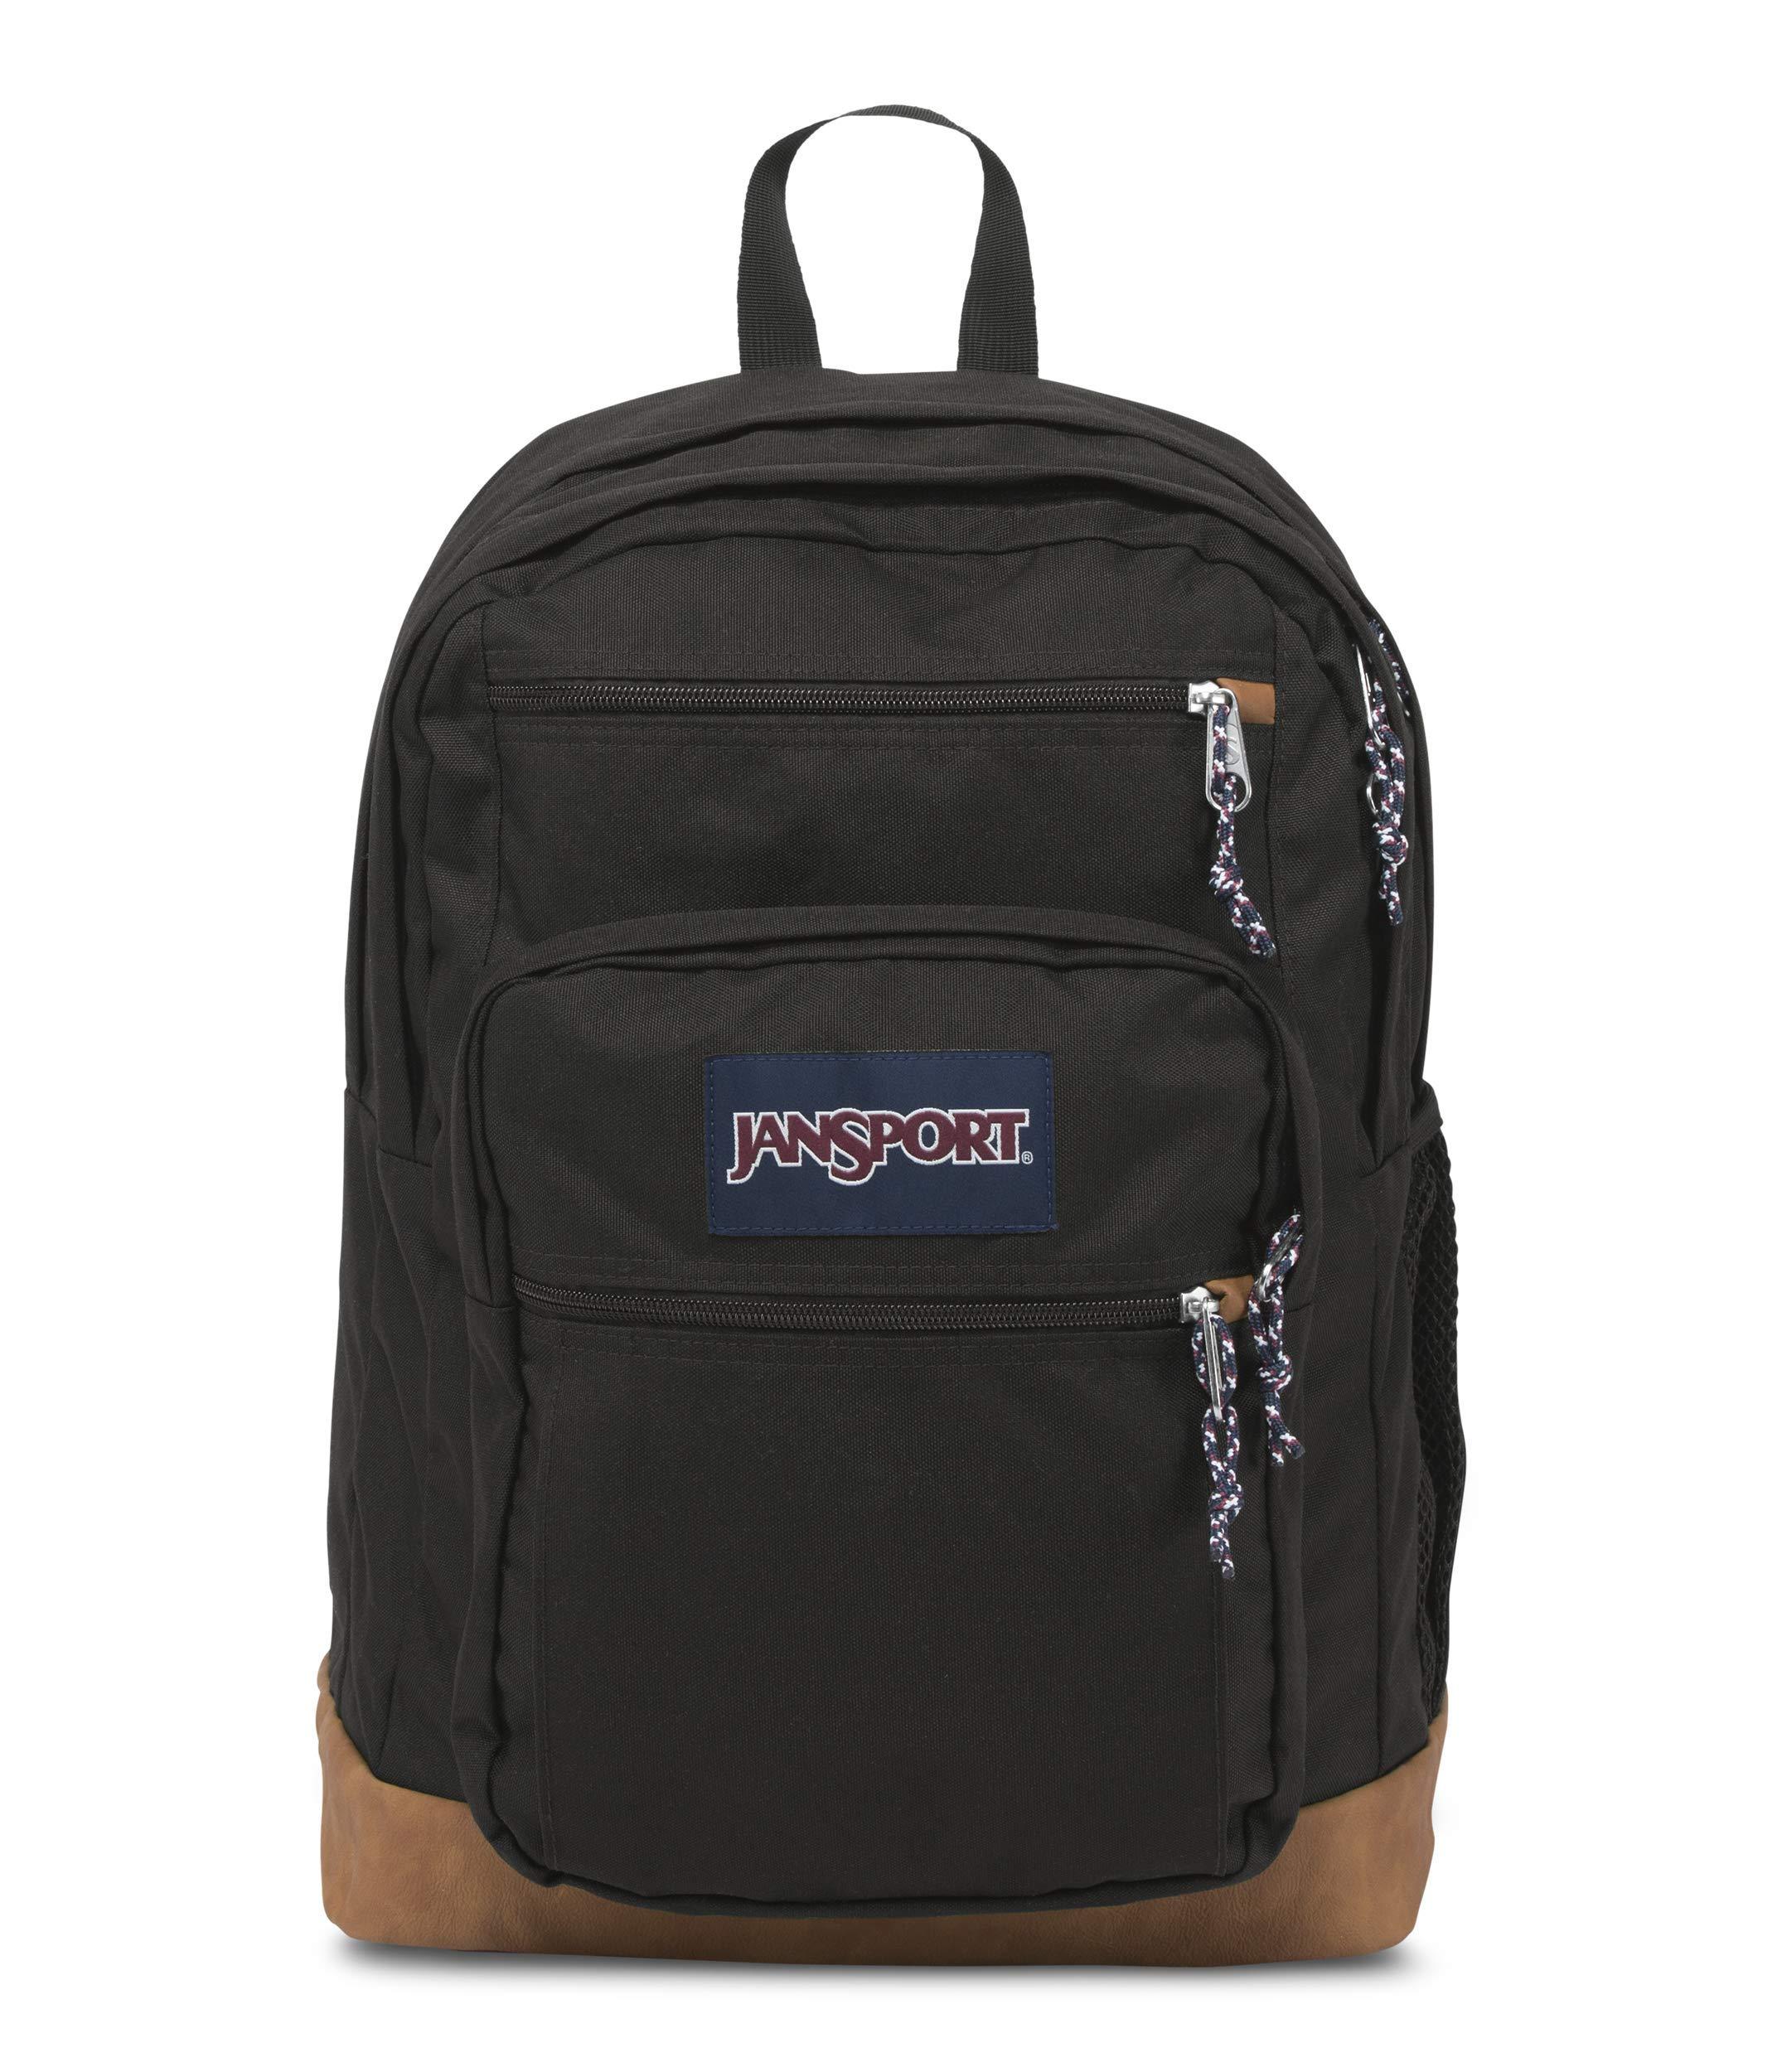 JanSport Cool Student 15-inch Laptop Backpack - Classic School Bag, Black by JanSport